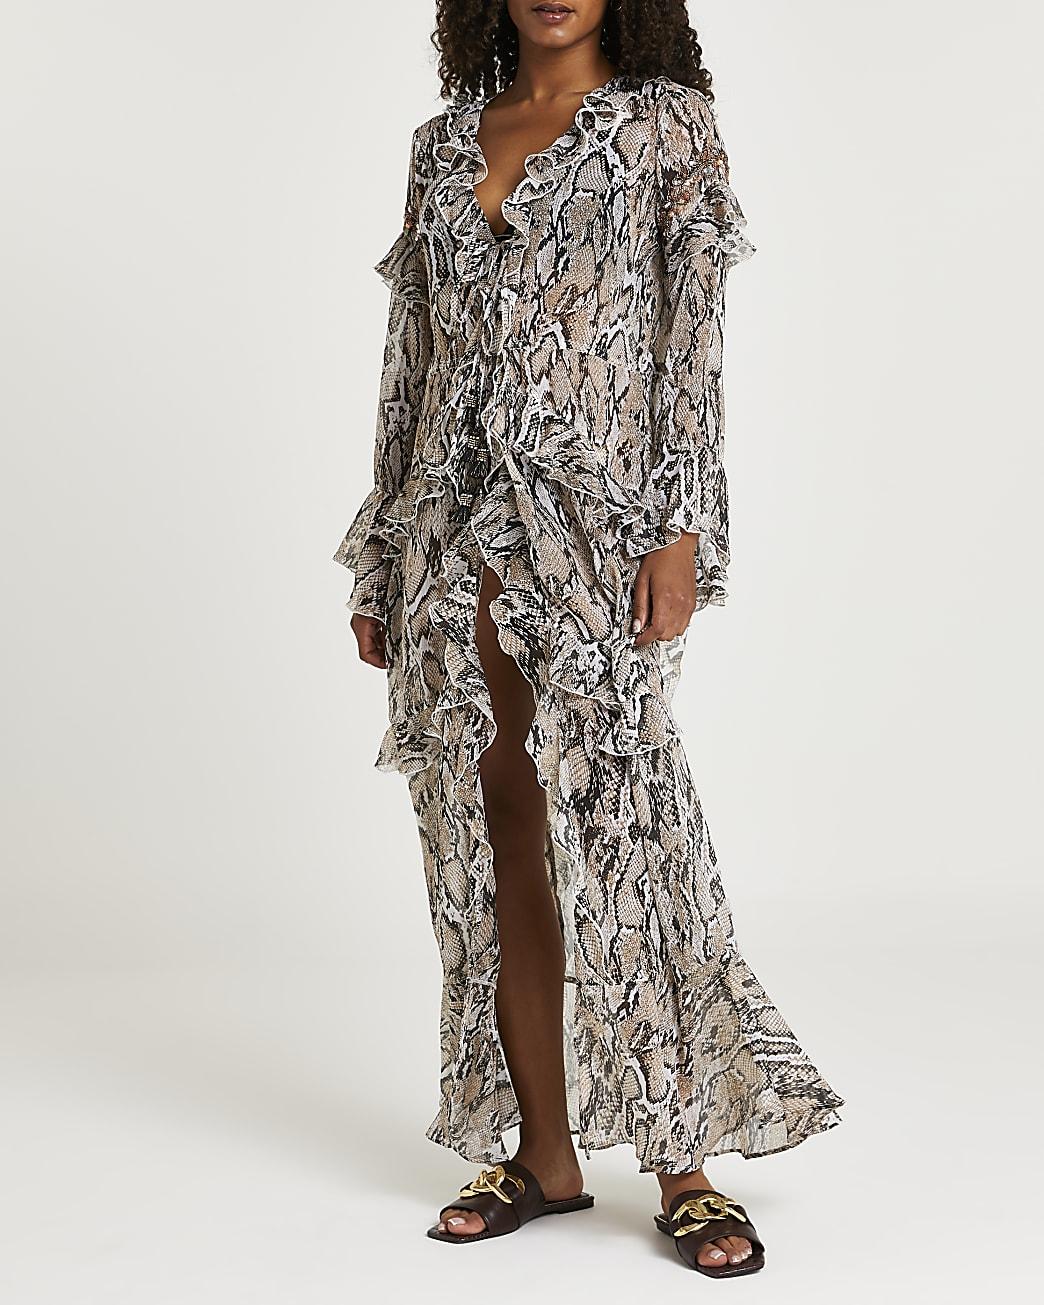 Beige animal print kaftan dress